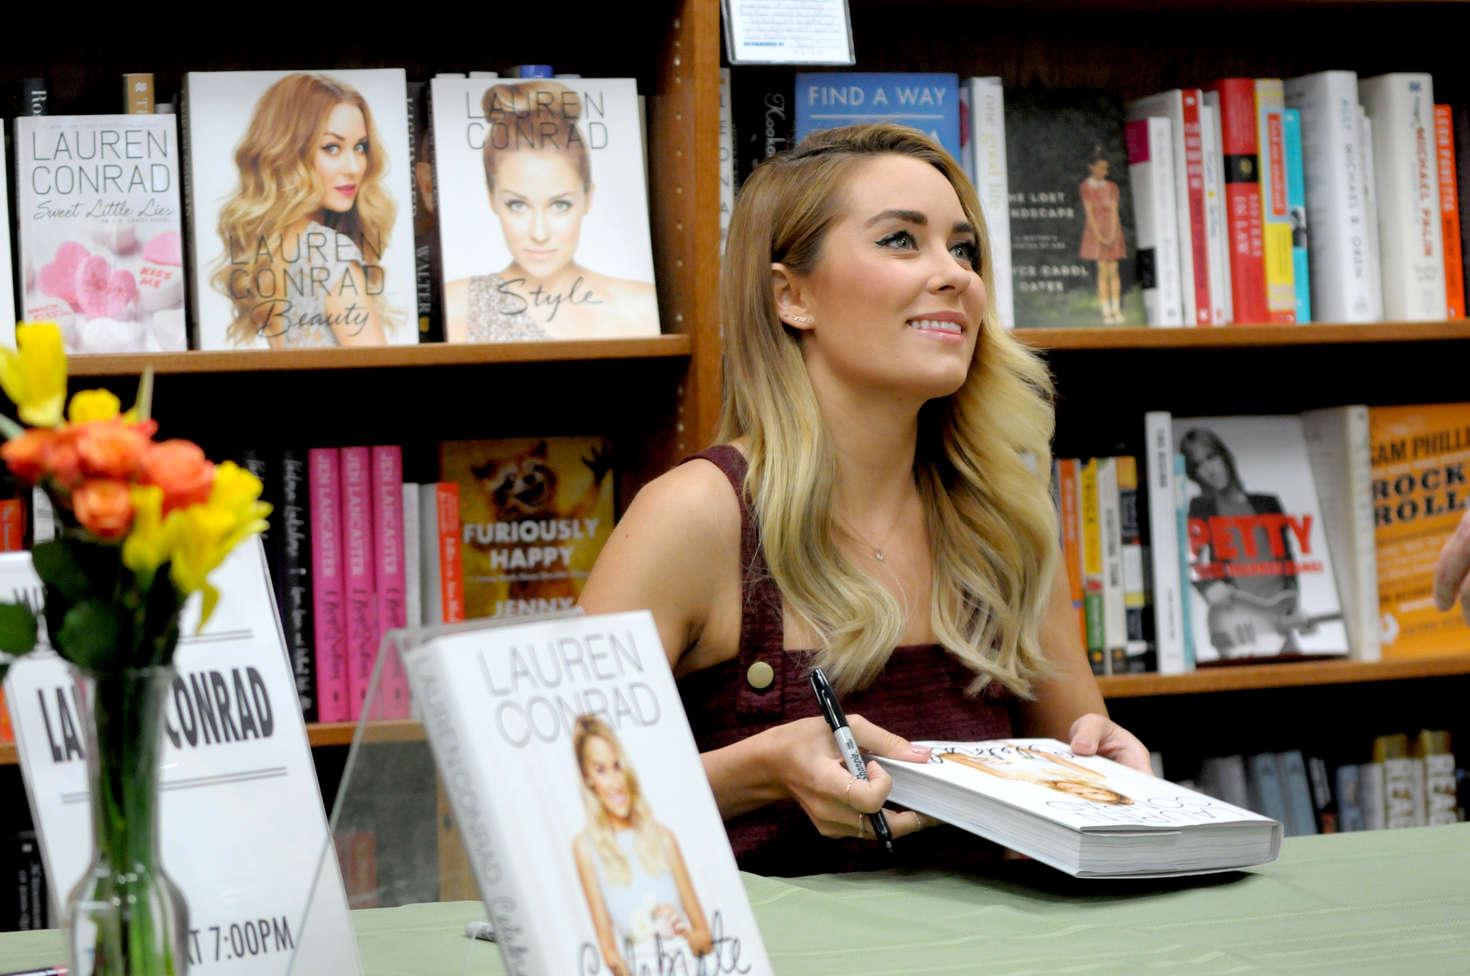 Lauren Conrad Signs copies of Celebrate at Andersons Bookshop in LaGrange